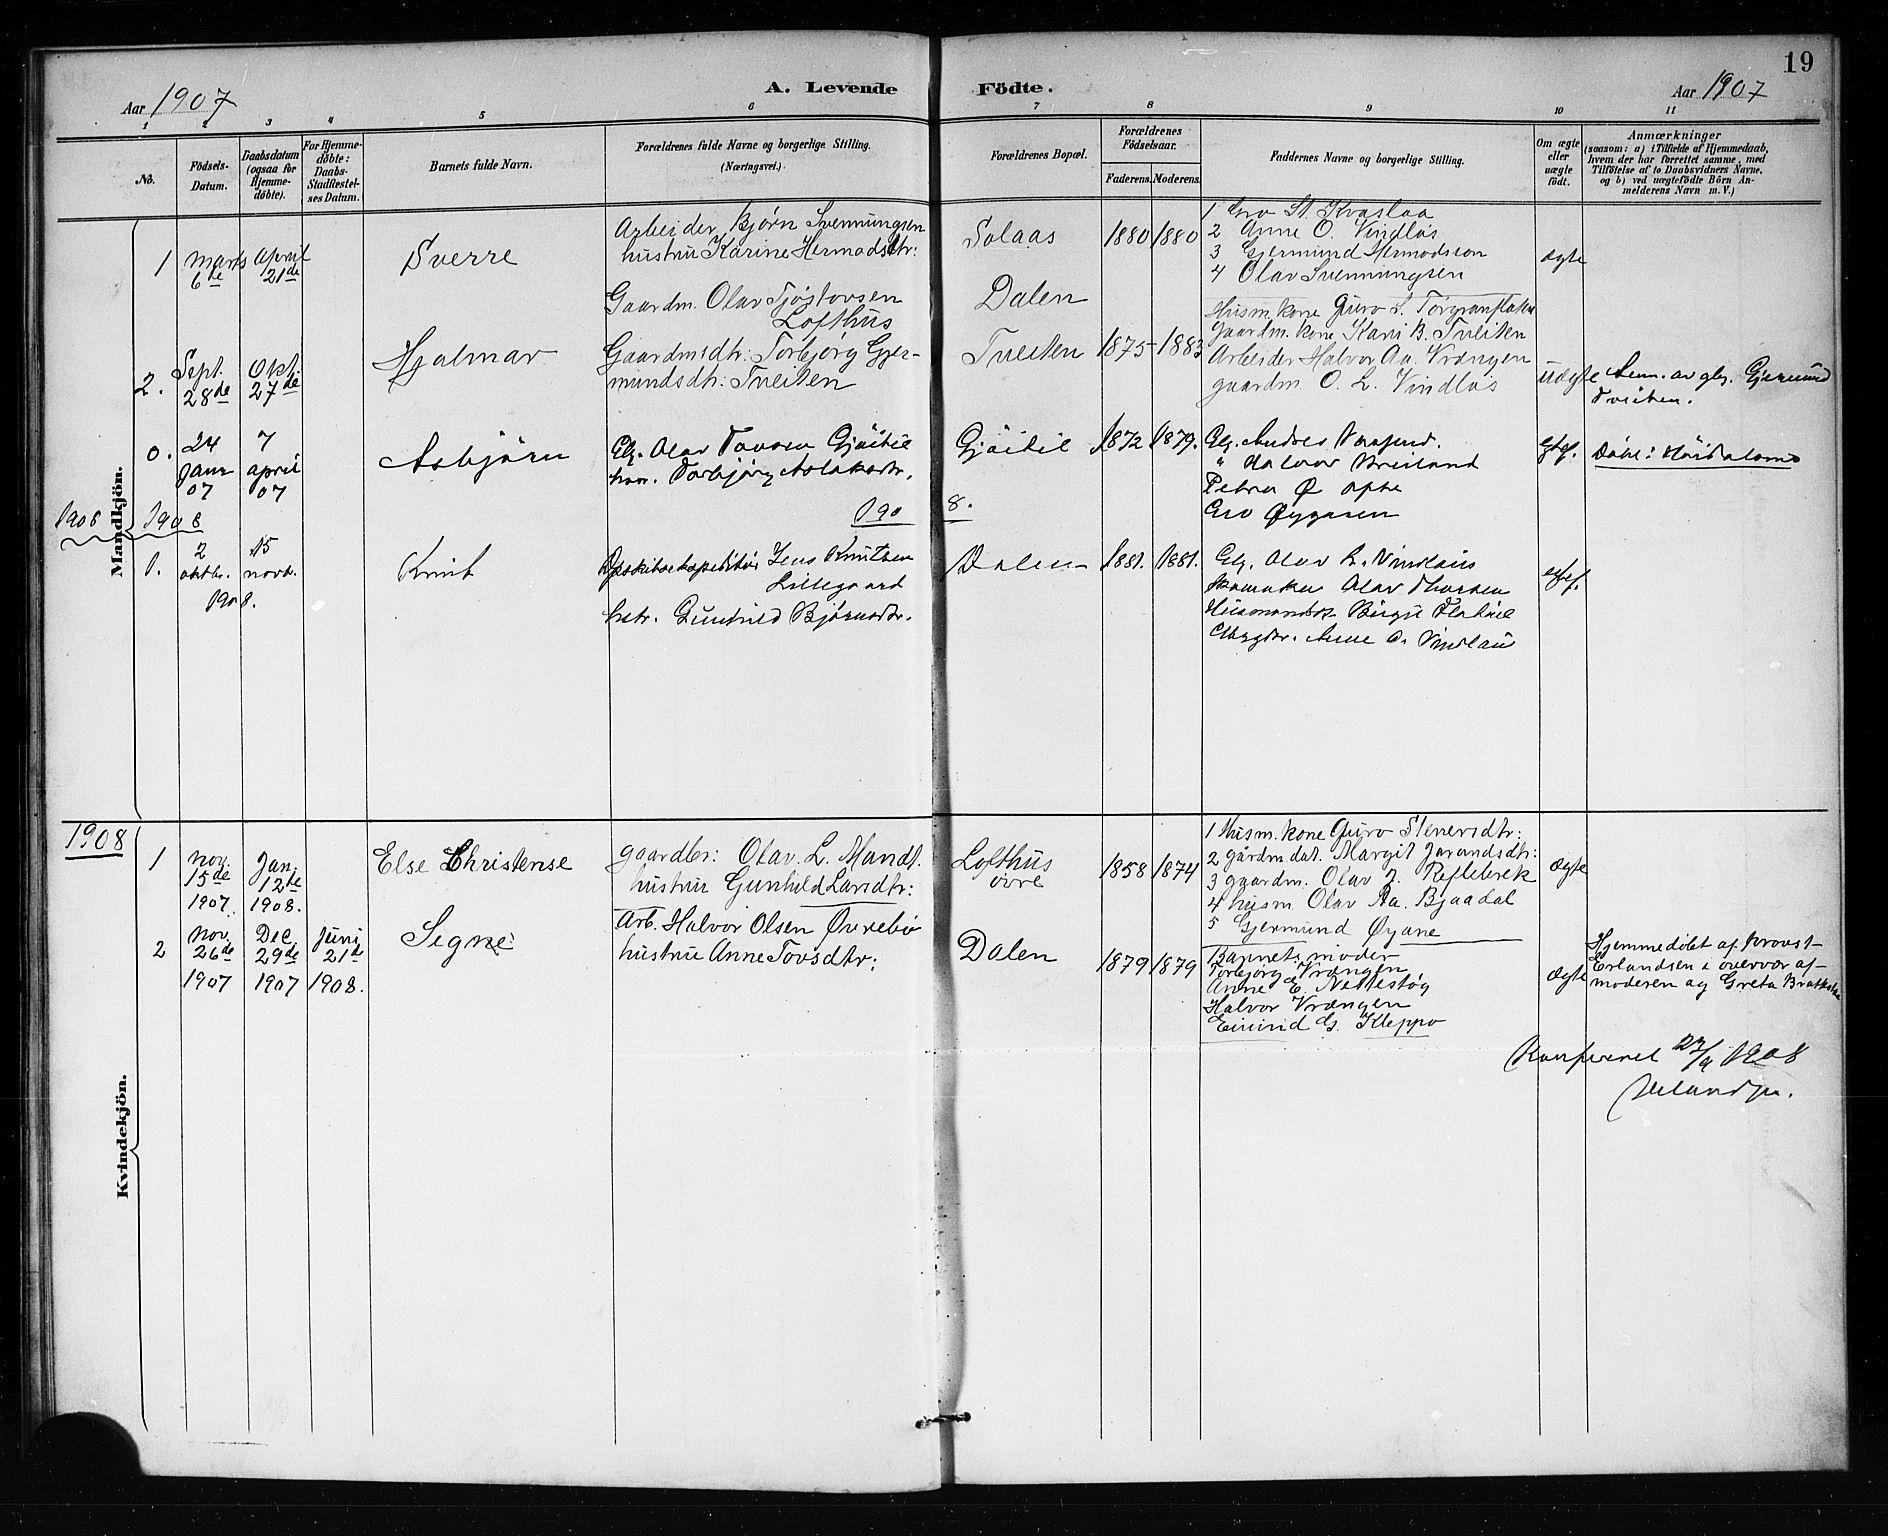 SAKO, Lårdal kirkebøker, G/Gb/L0003: Klokkerbok nr. II 3, 1889-1920, s. 19